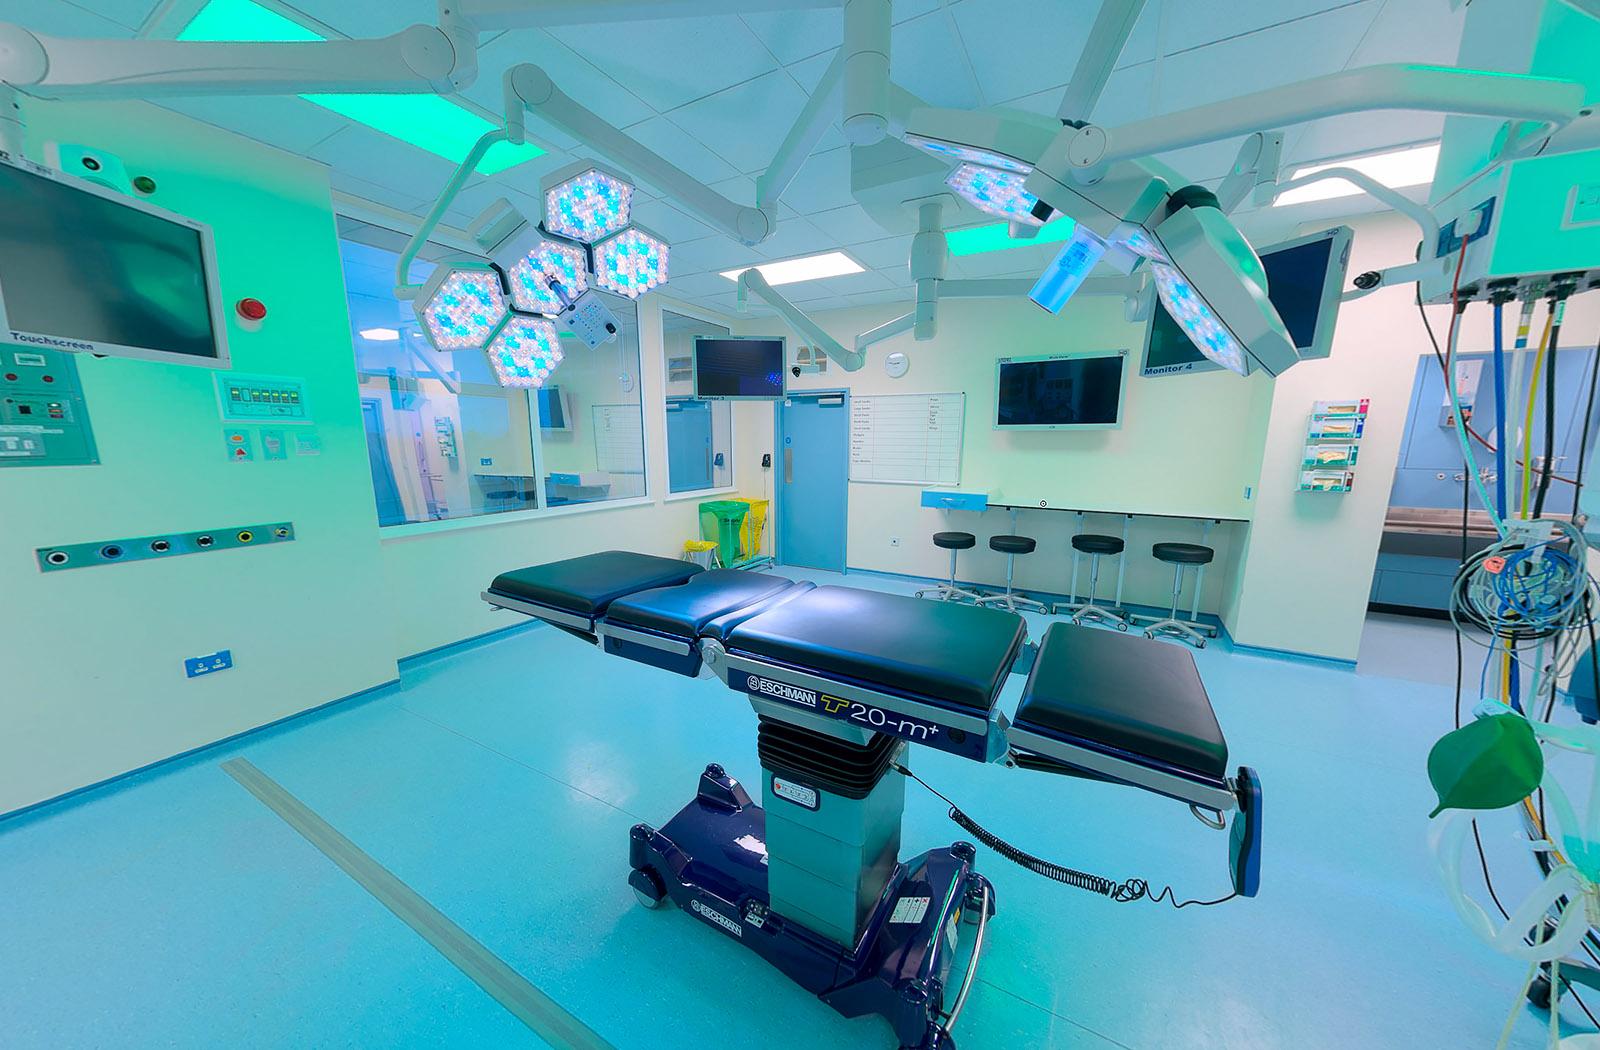 NHS Poole Hospital